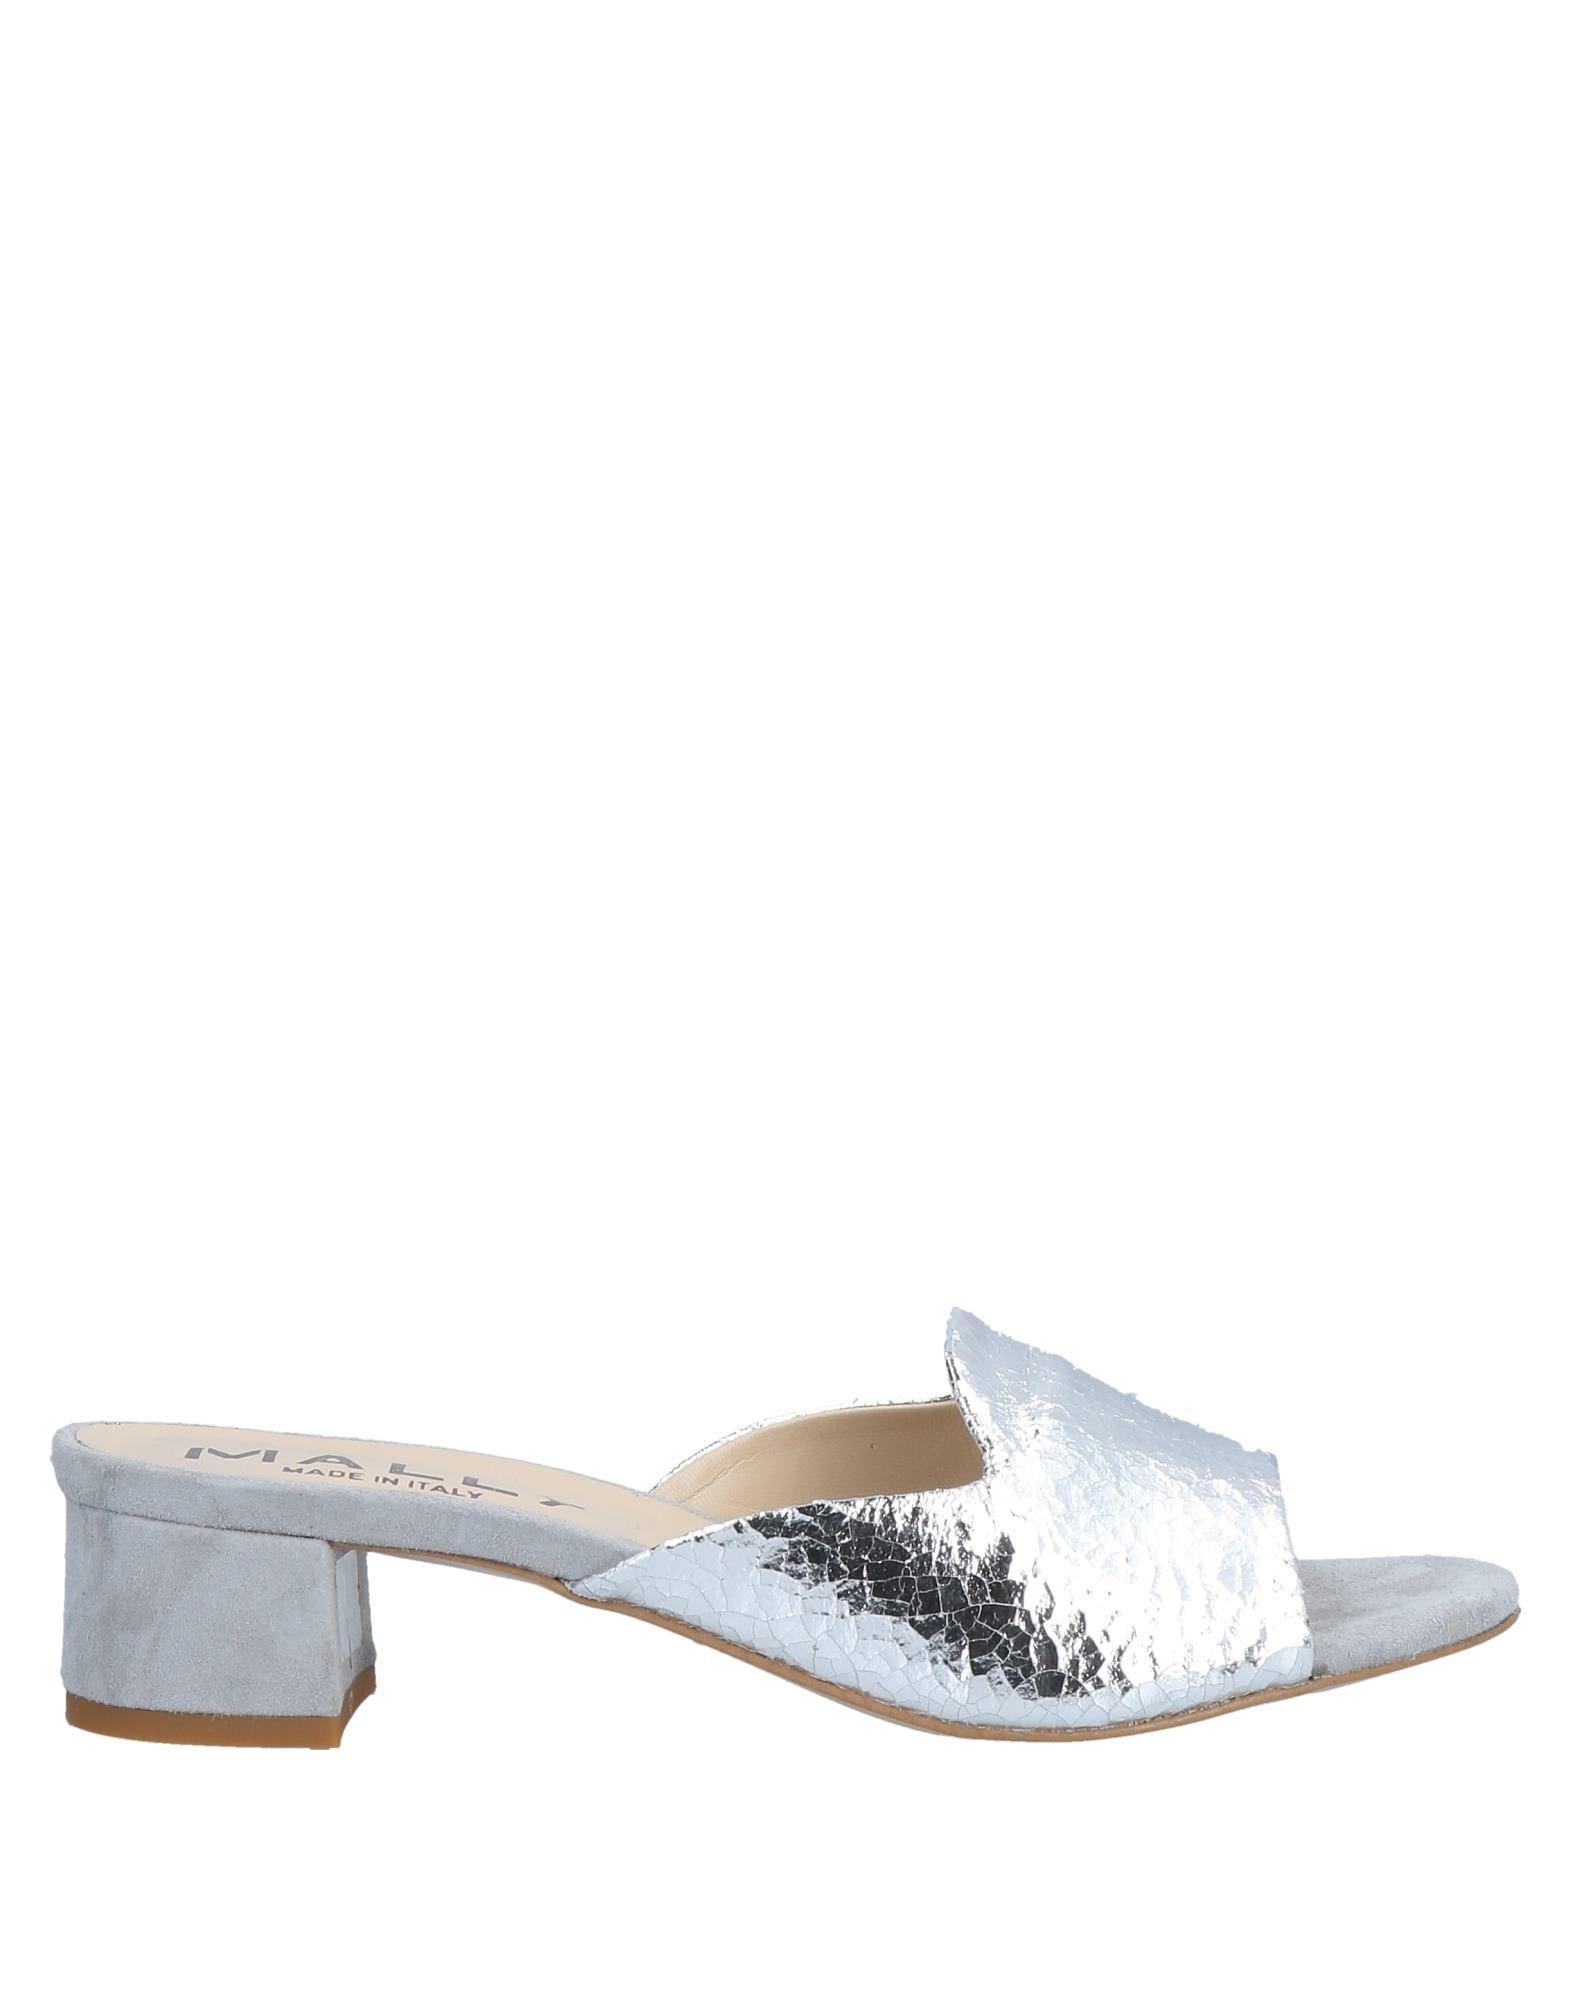 f2129e519cf Lyst - Mally Sandals in Metallic